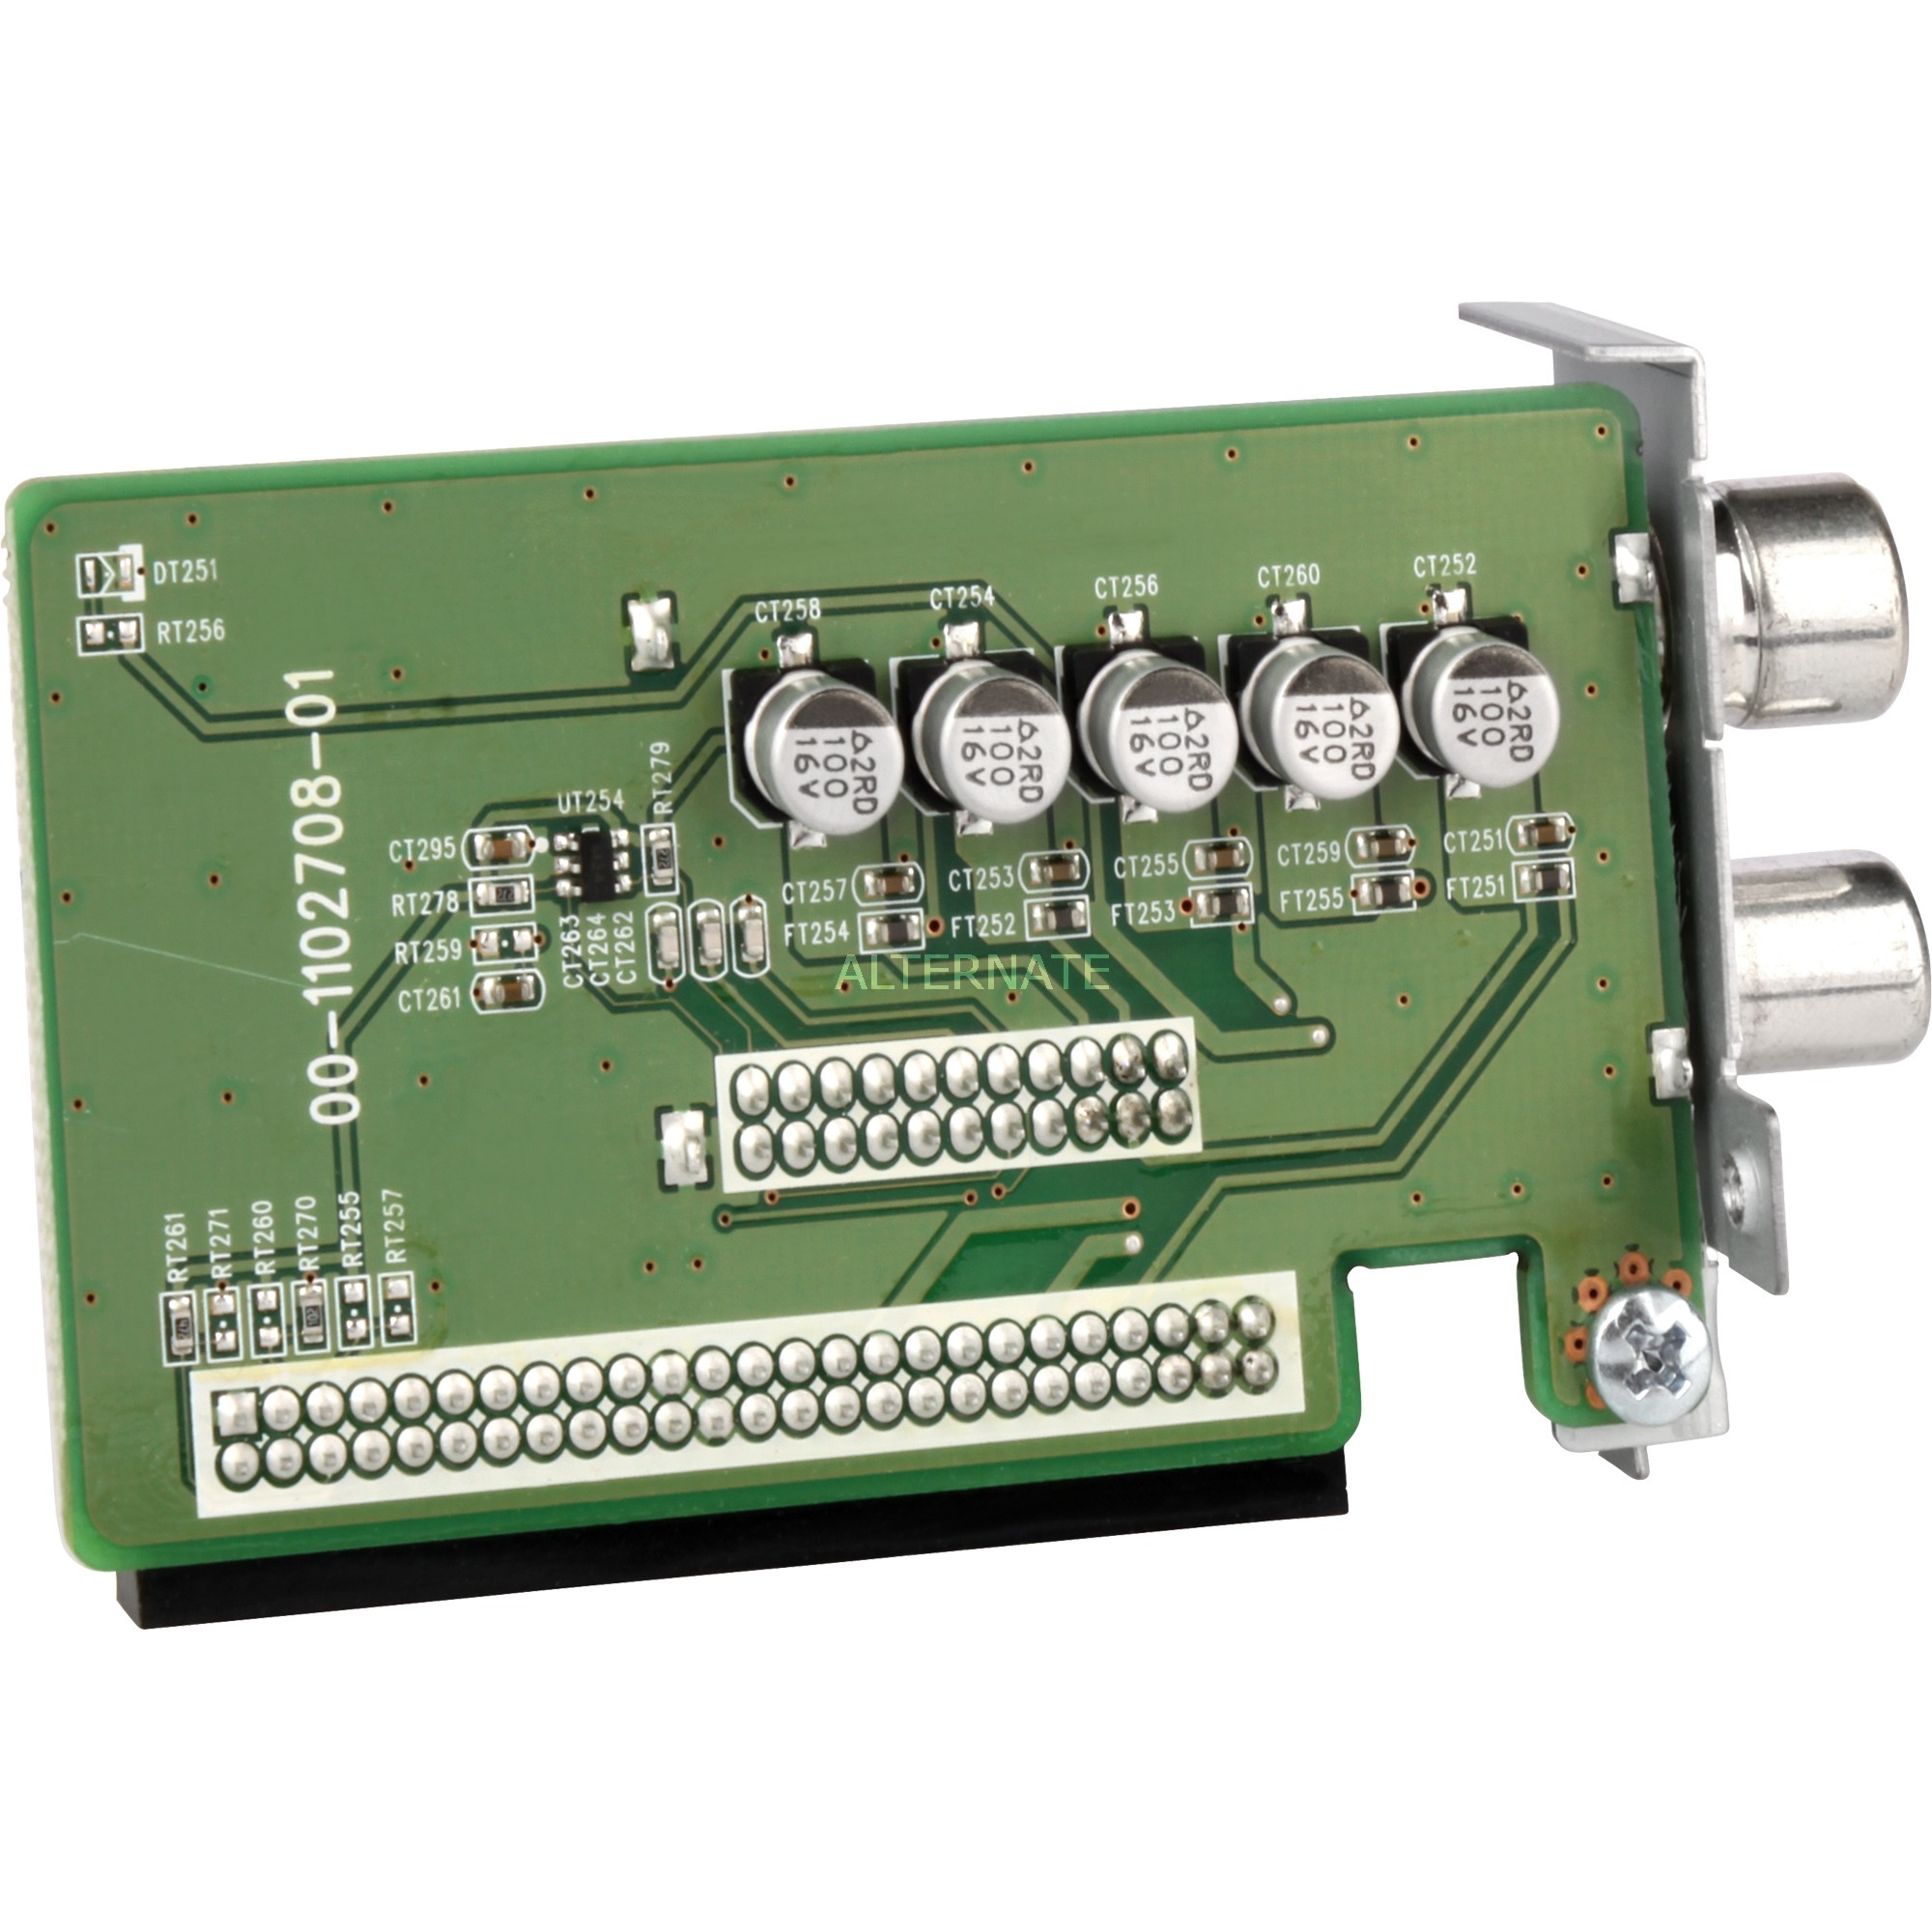 DVB-C/T2 Tuner, Sintonizador